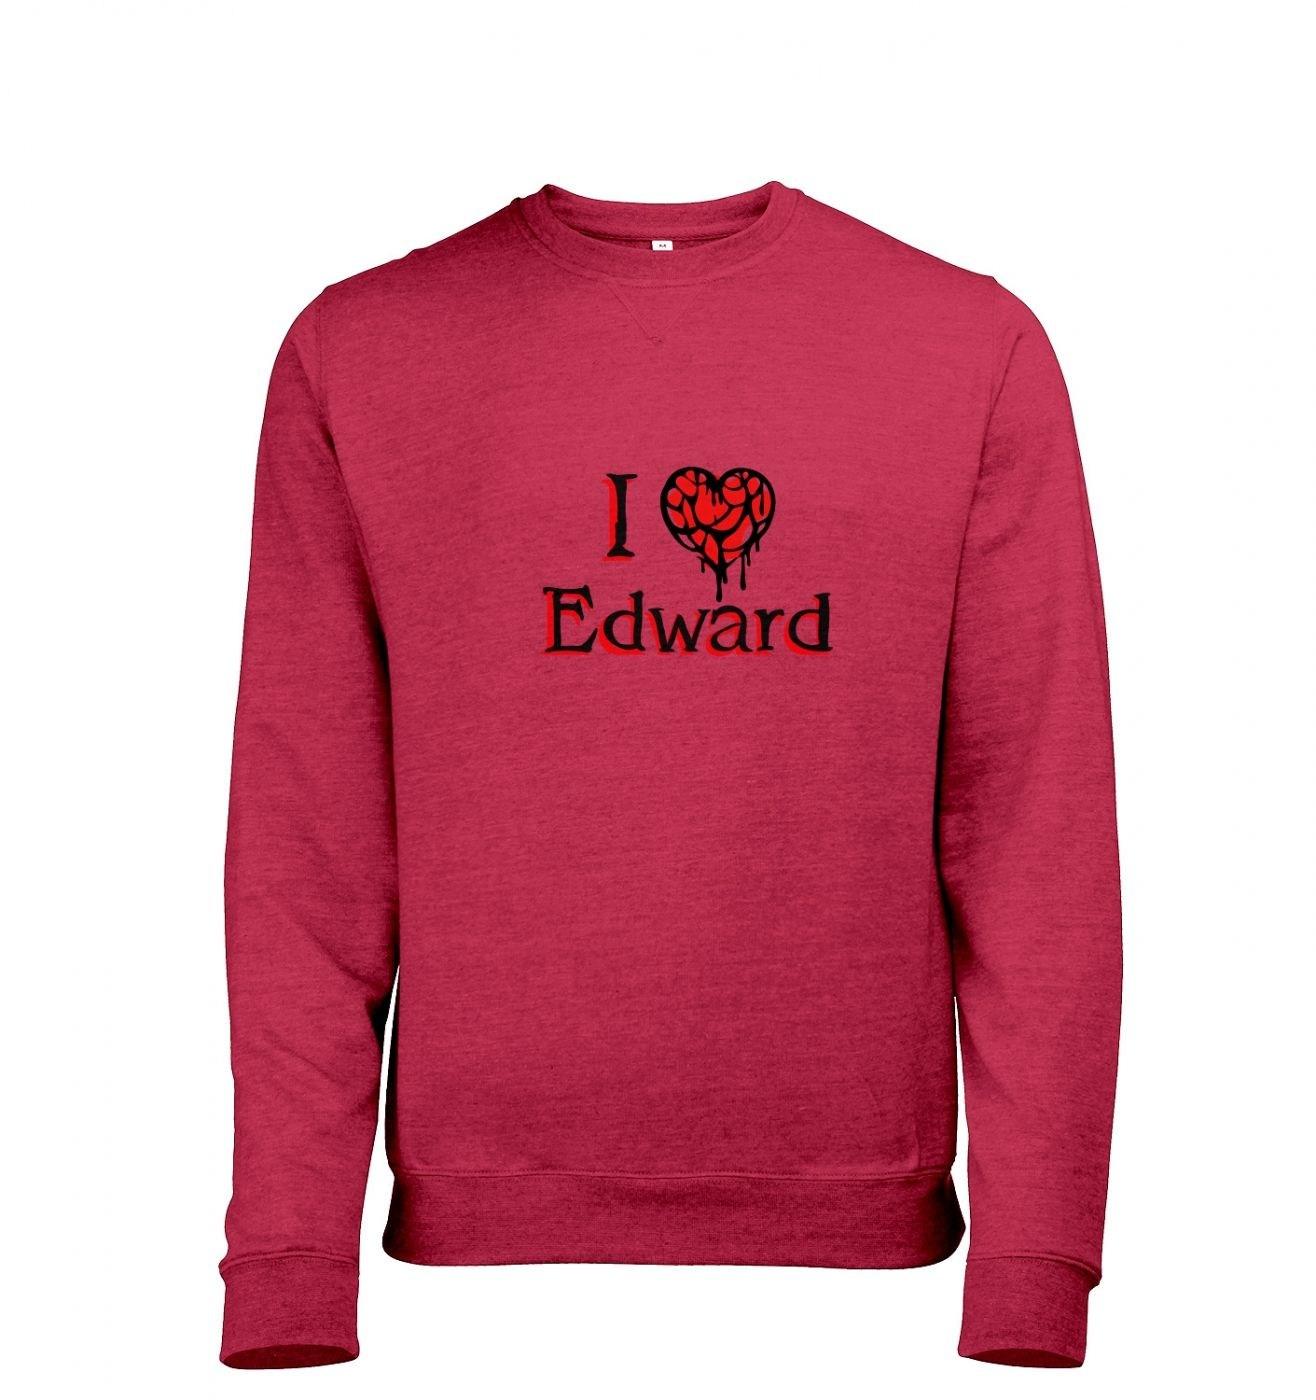 I heart Edward Mens Heather Sweatshirt   - Inspired by Twilight